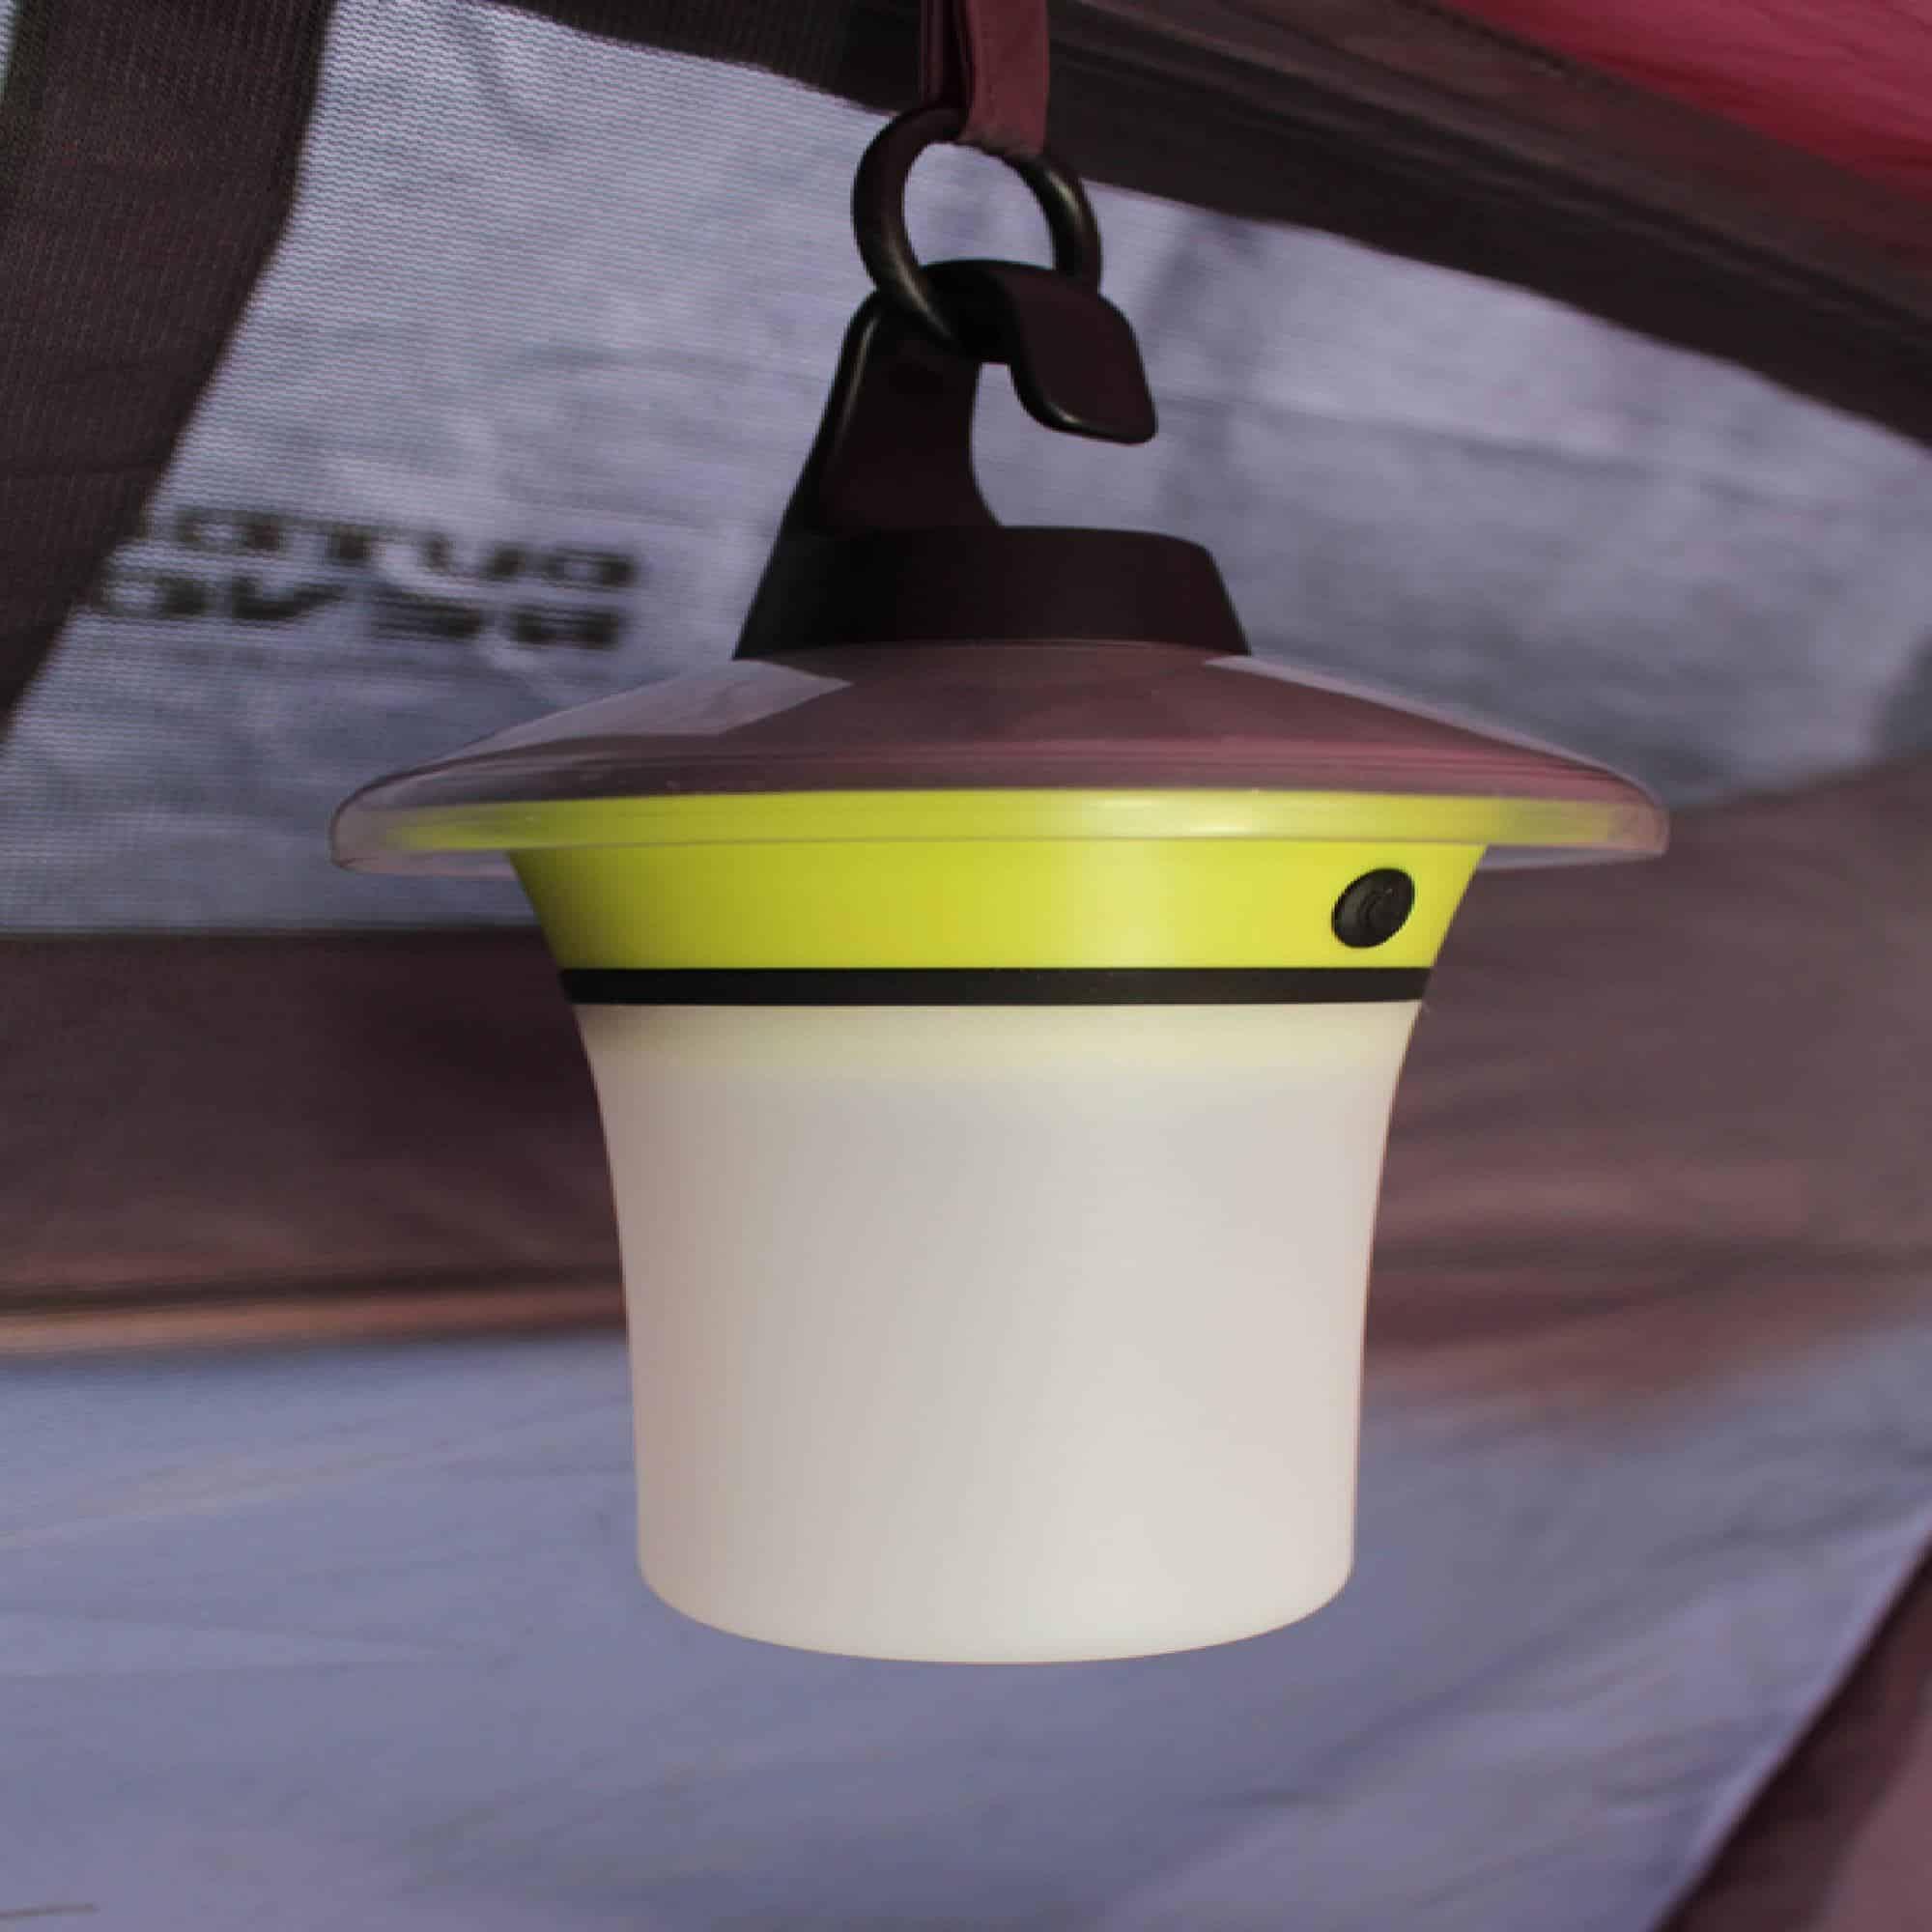 New Outdoor Revolution Lumi Solar Powered Camping Tent Awning Lantern Light